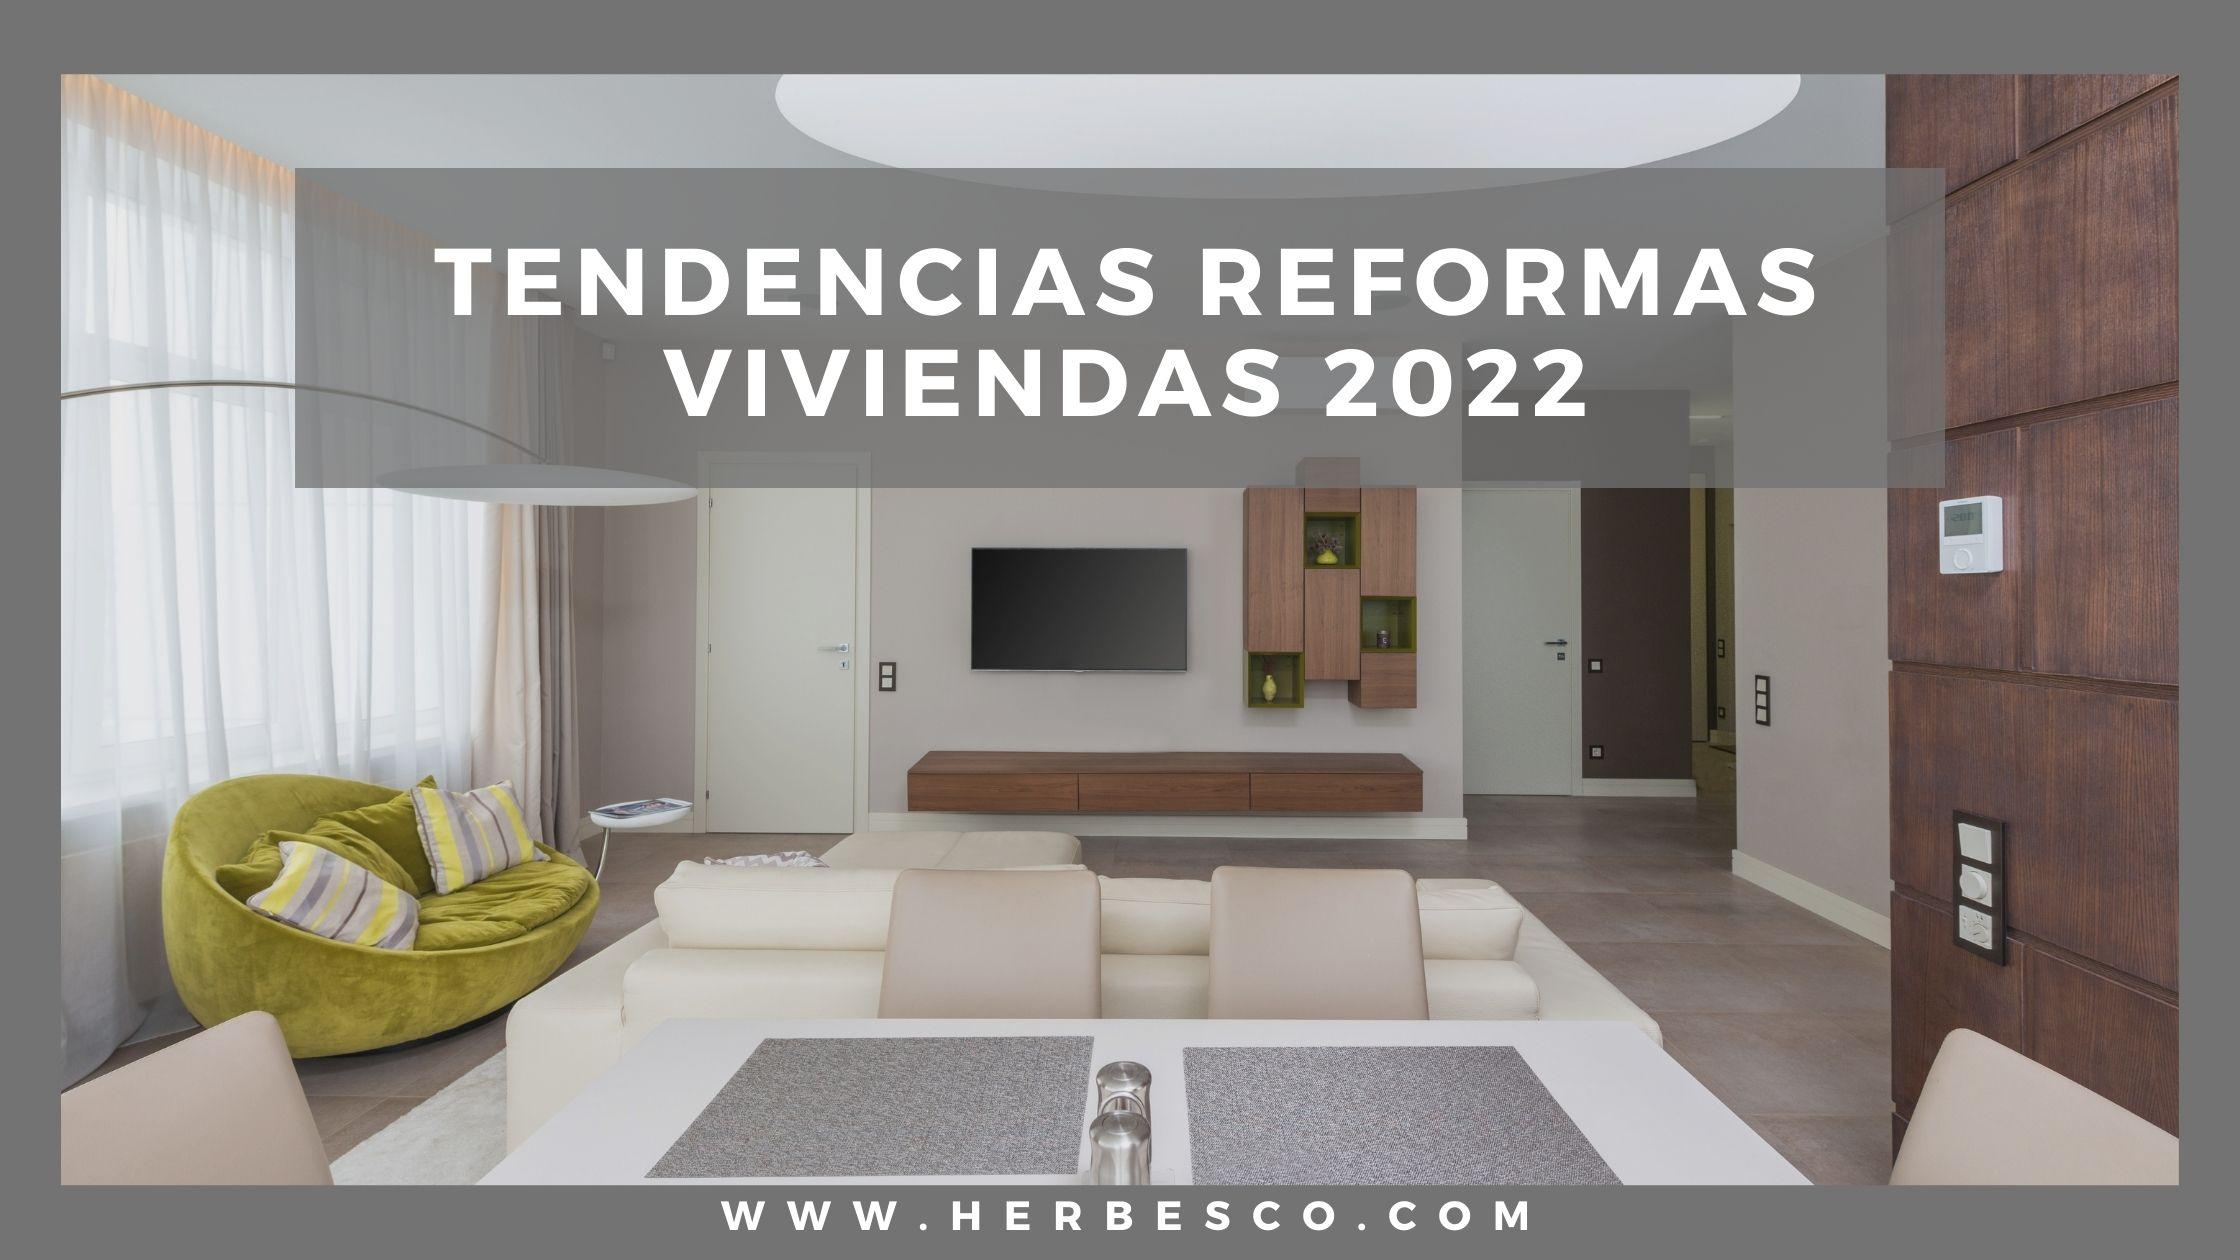 tendencias-reformas-viviendas-2022-1